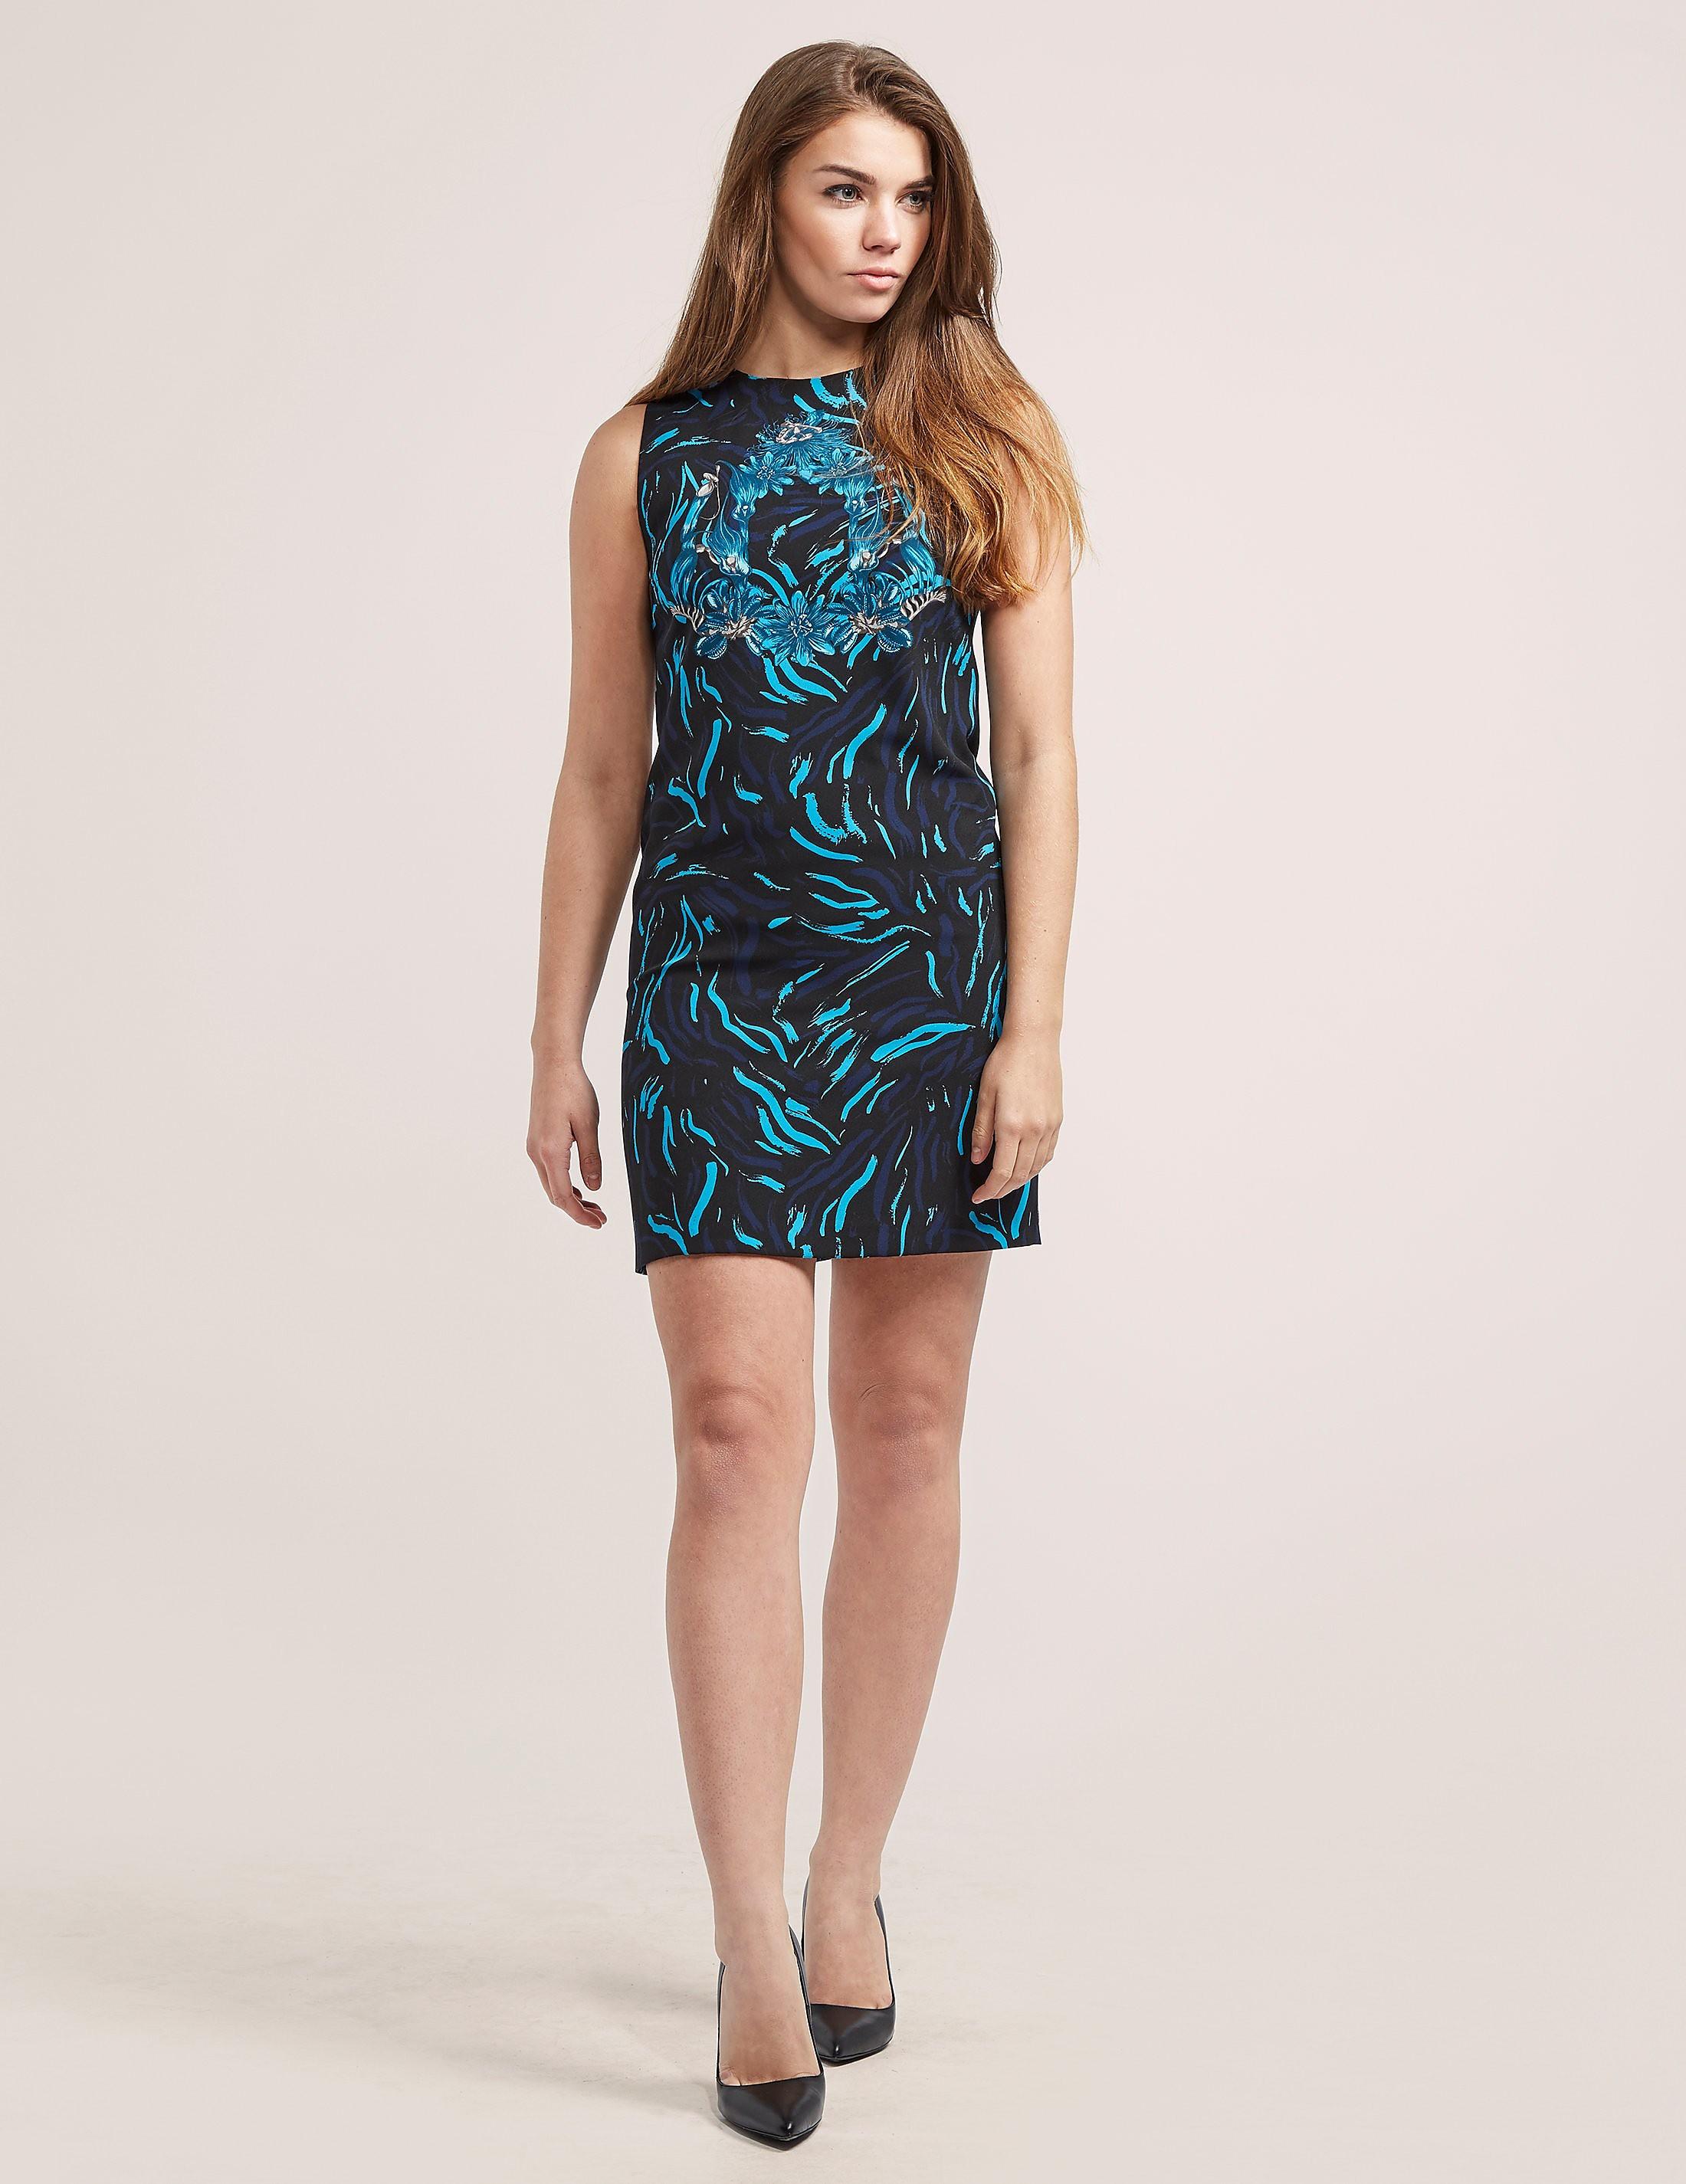 Versus Versace Floral Print Shift Dress